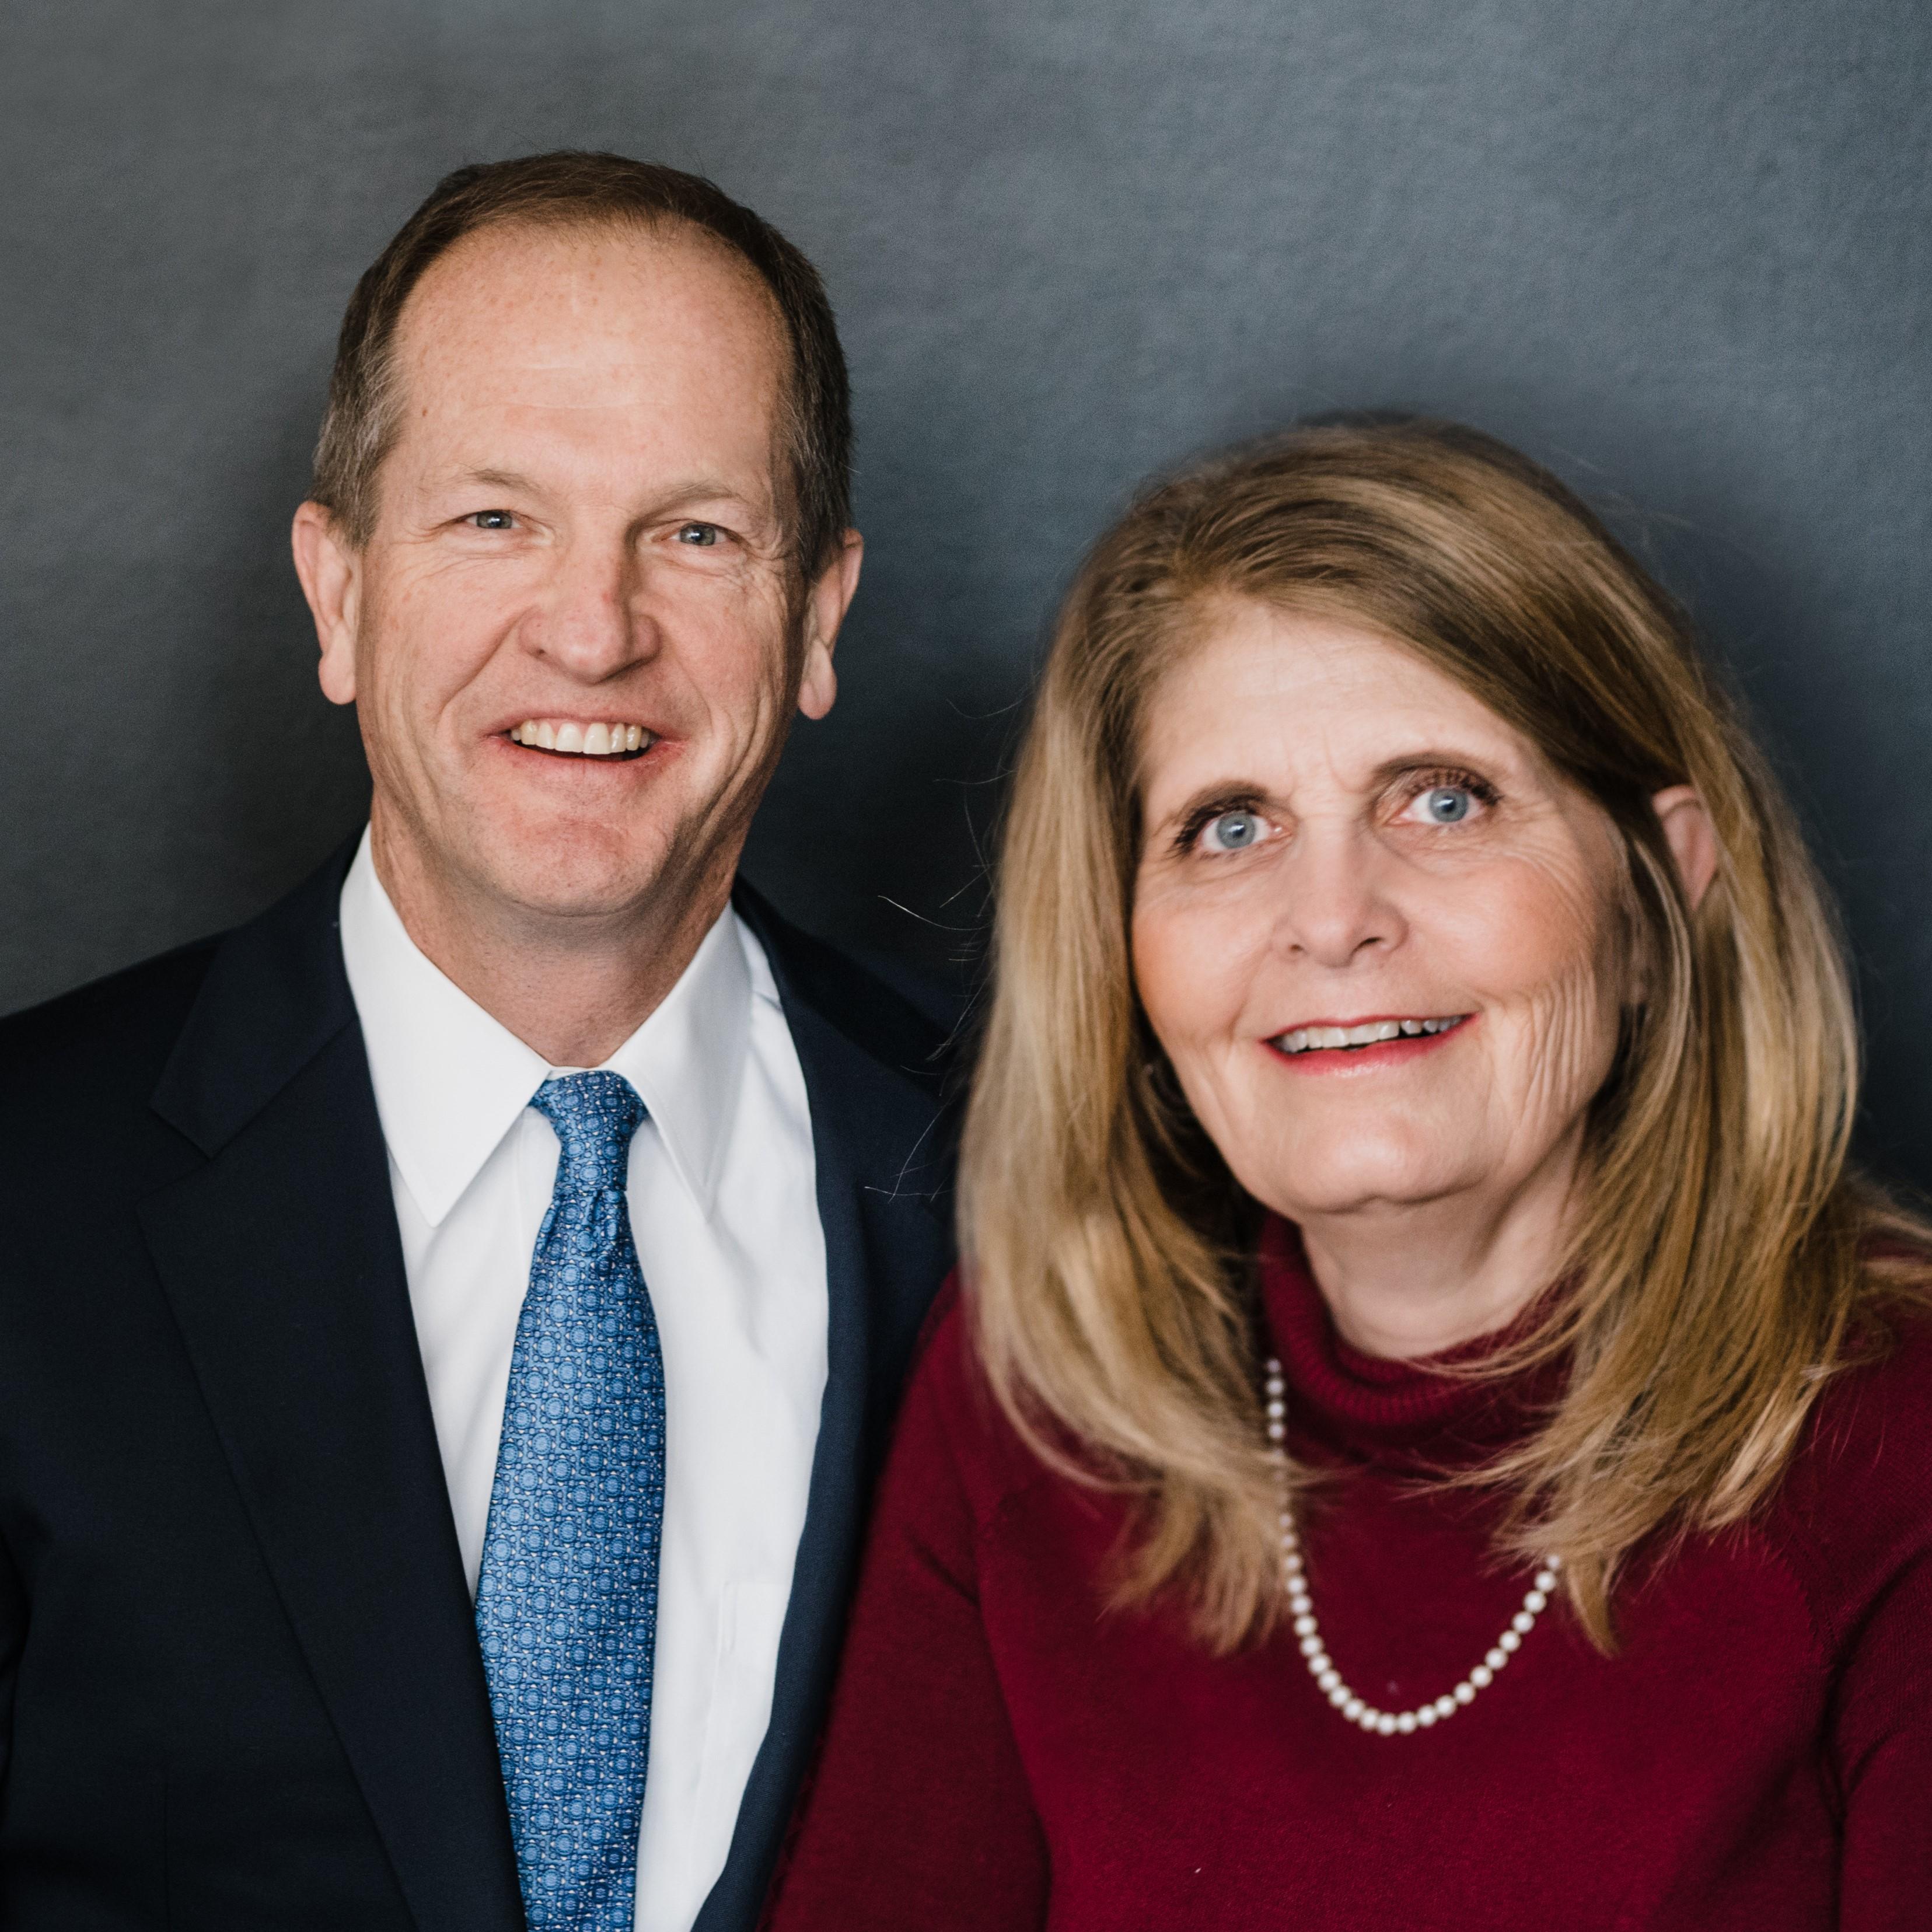 Clark and Jennifer Whitworth